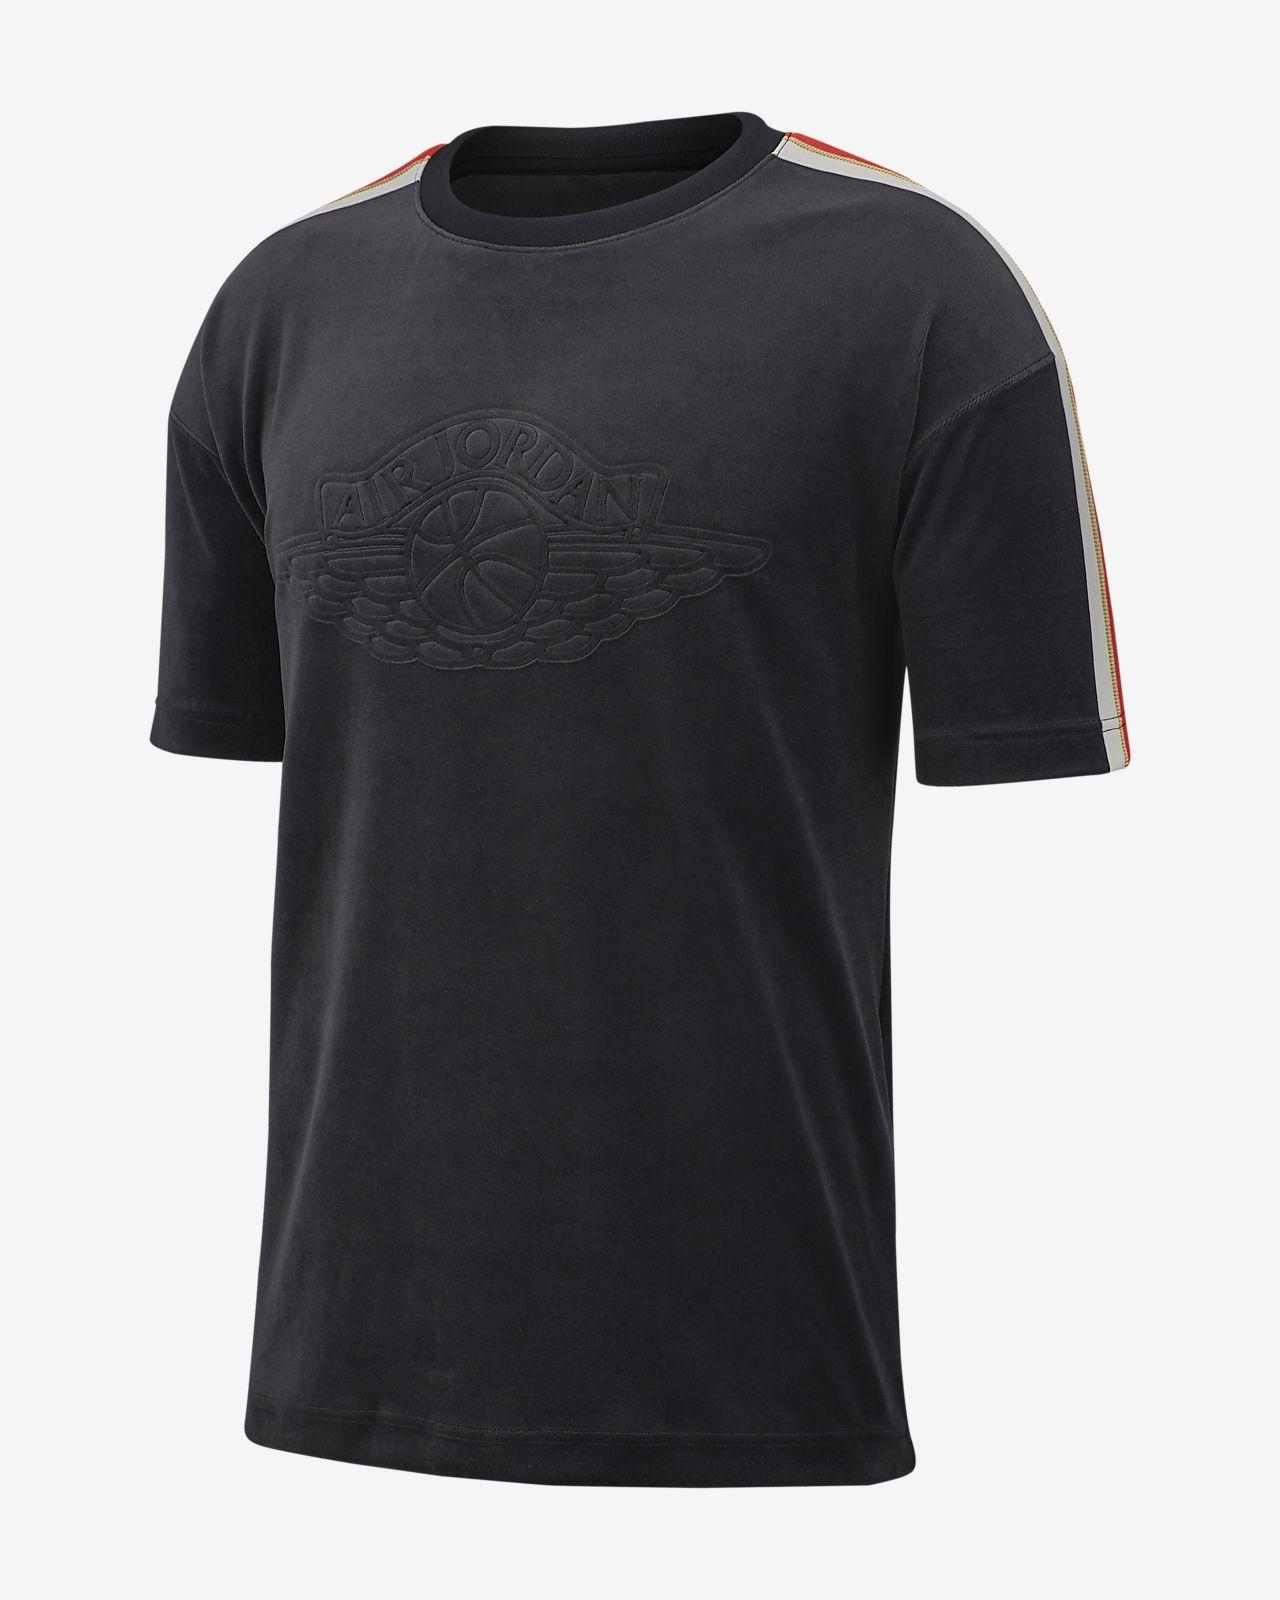 f61fb86532c46a Jordan Gold Chain Men s Short-Sleeve Top. Nike.com